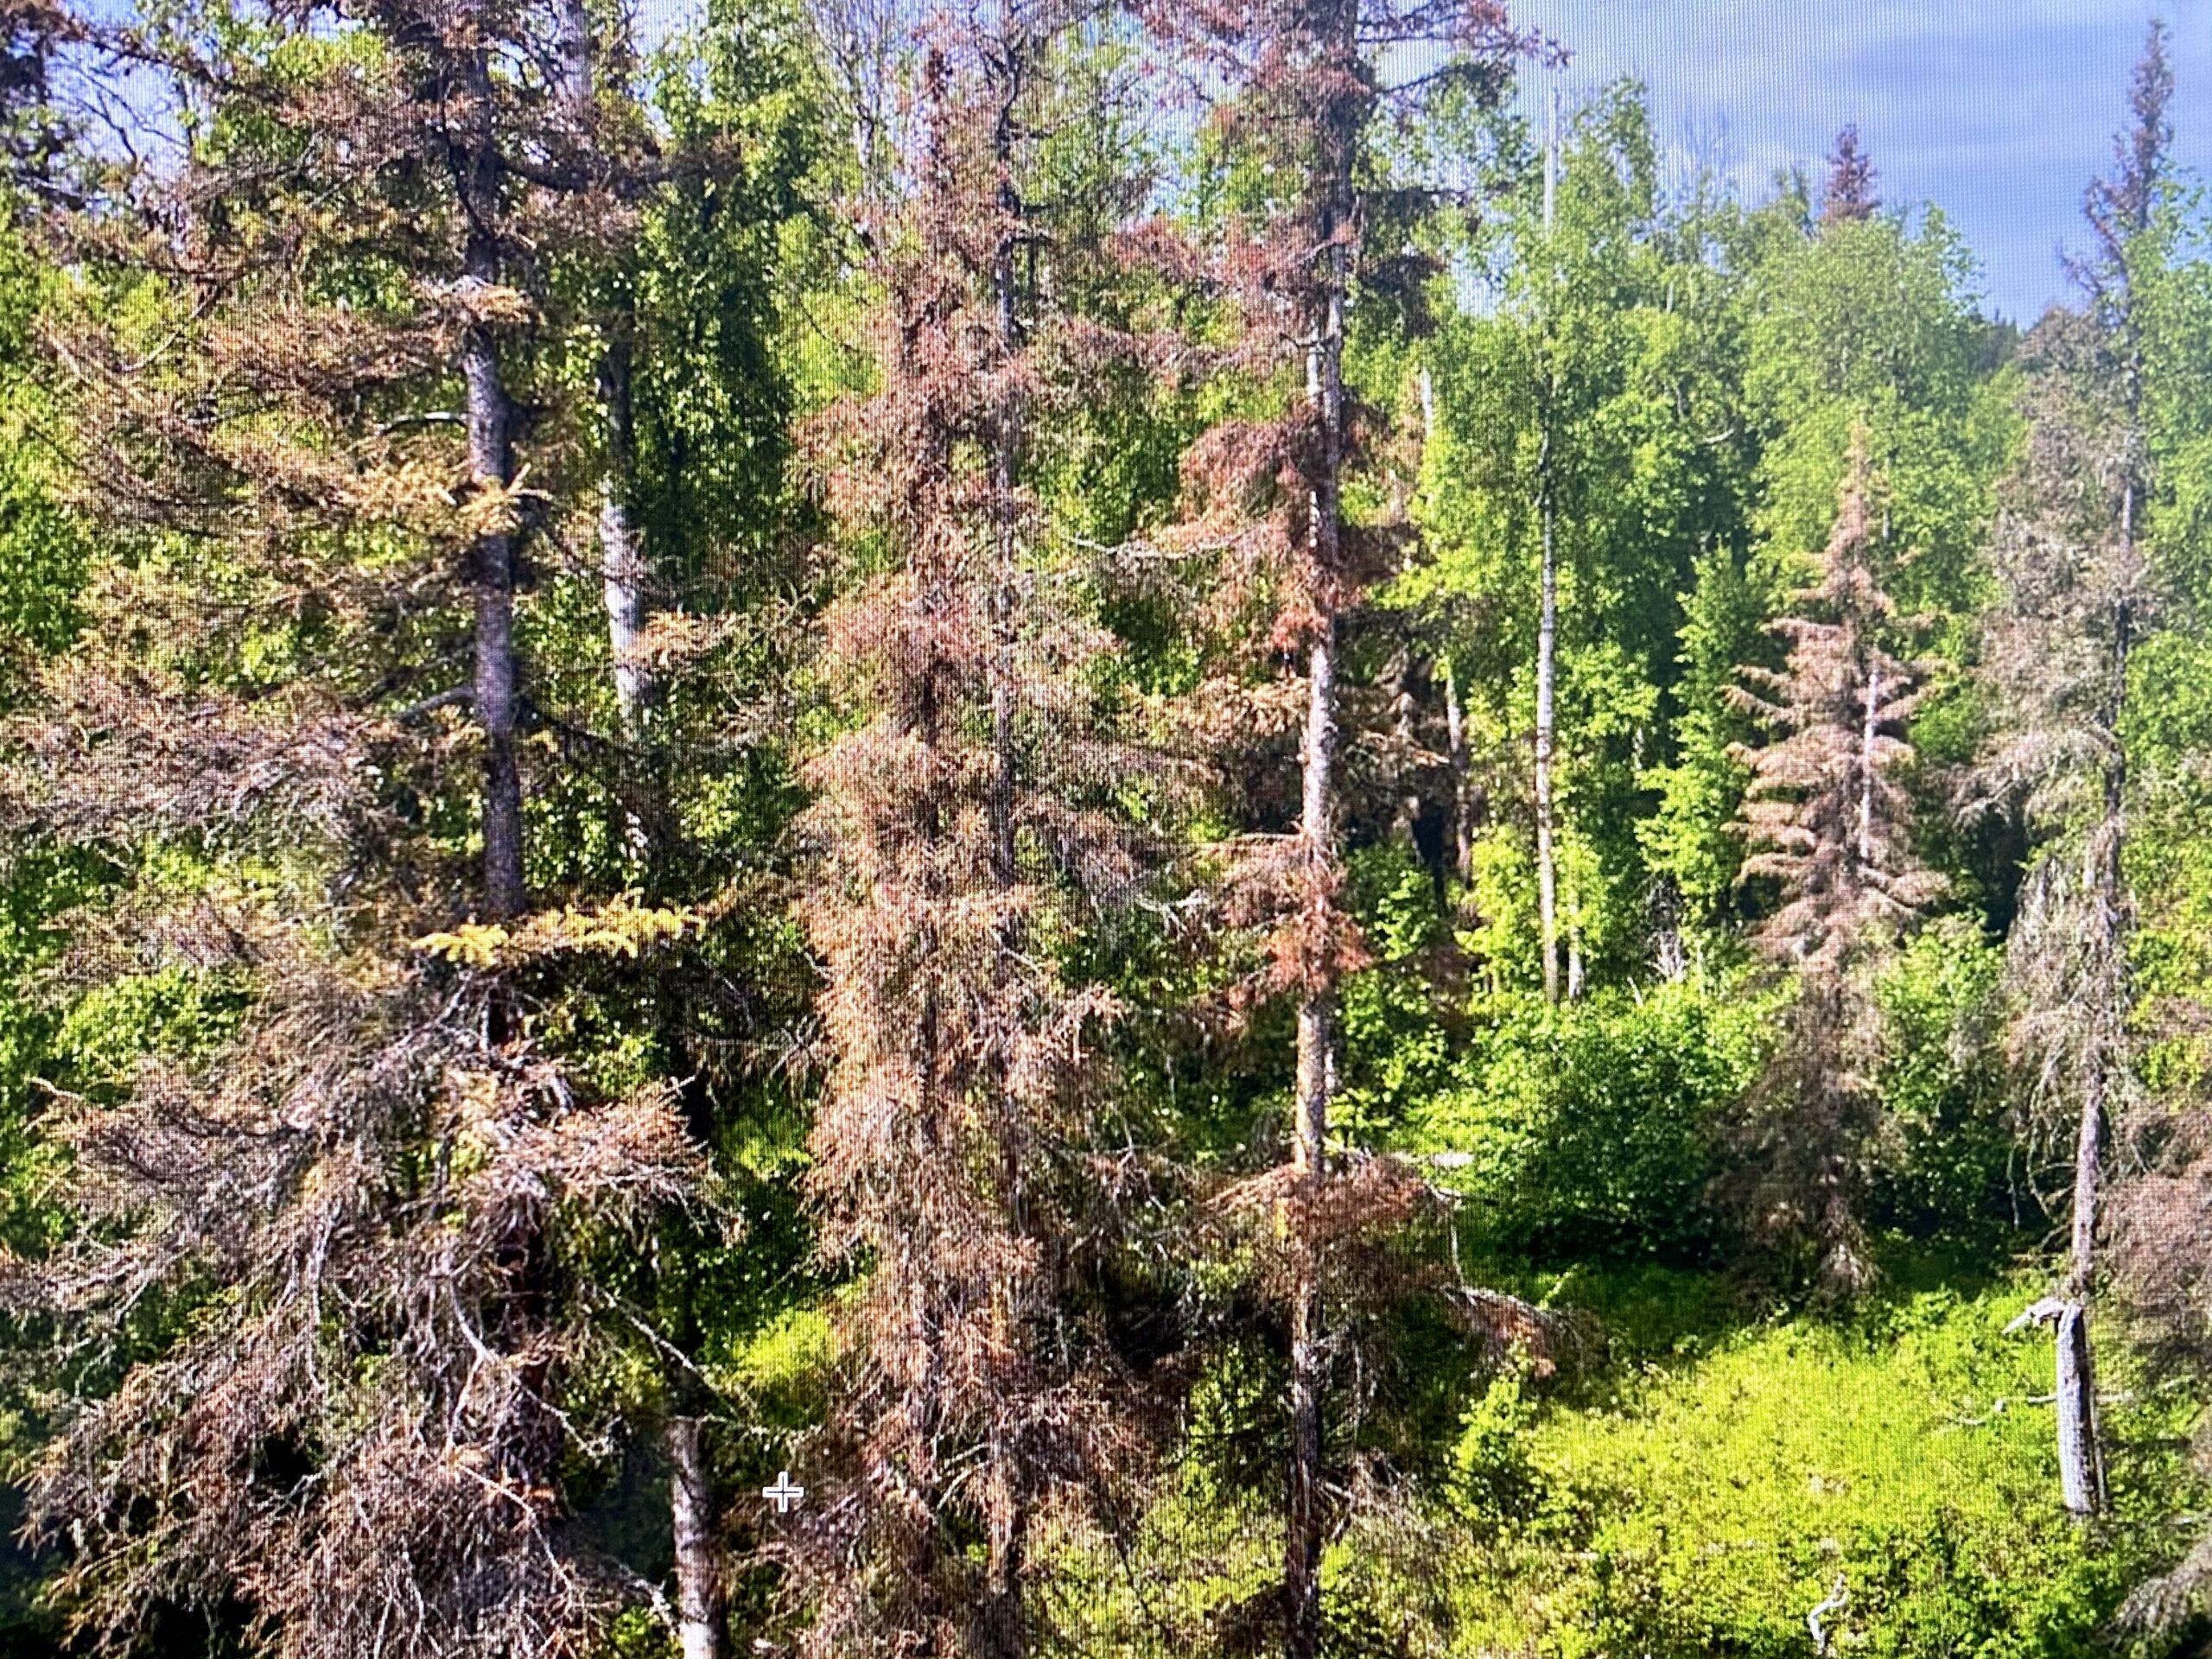 spruce beetle extermination